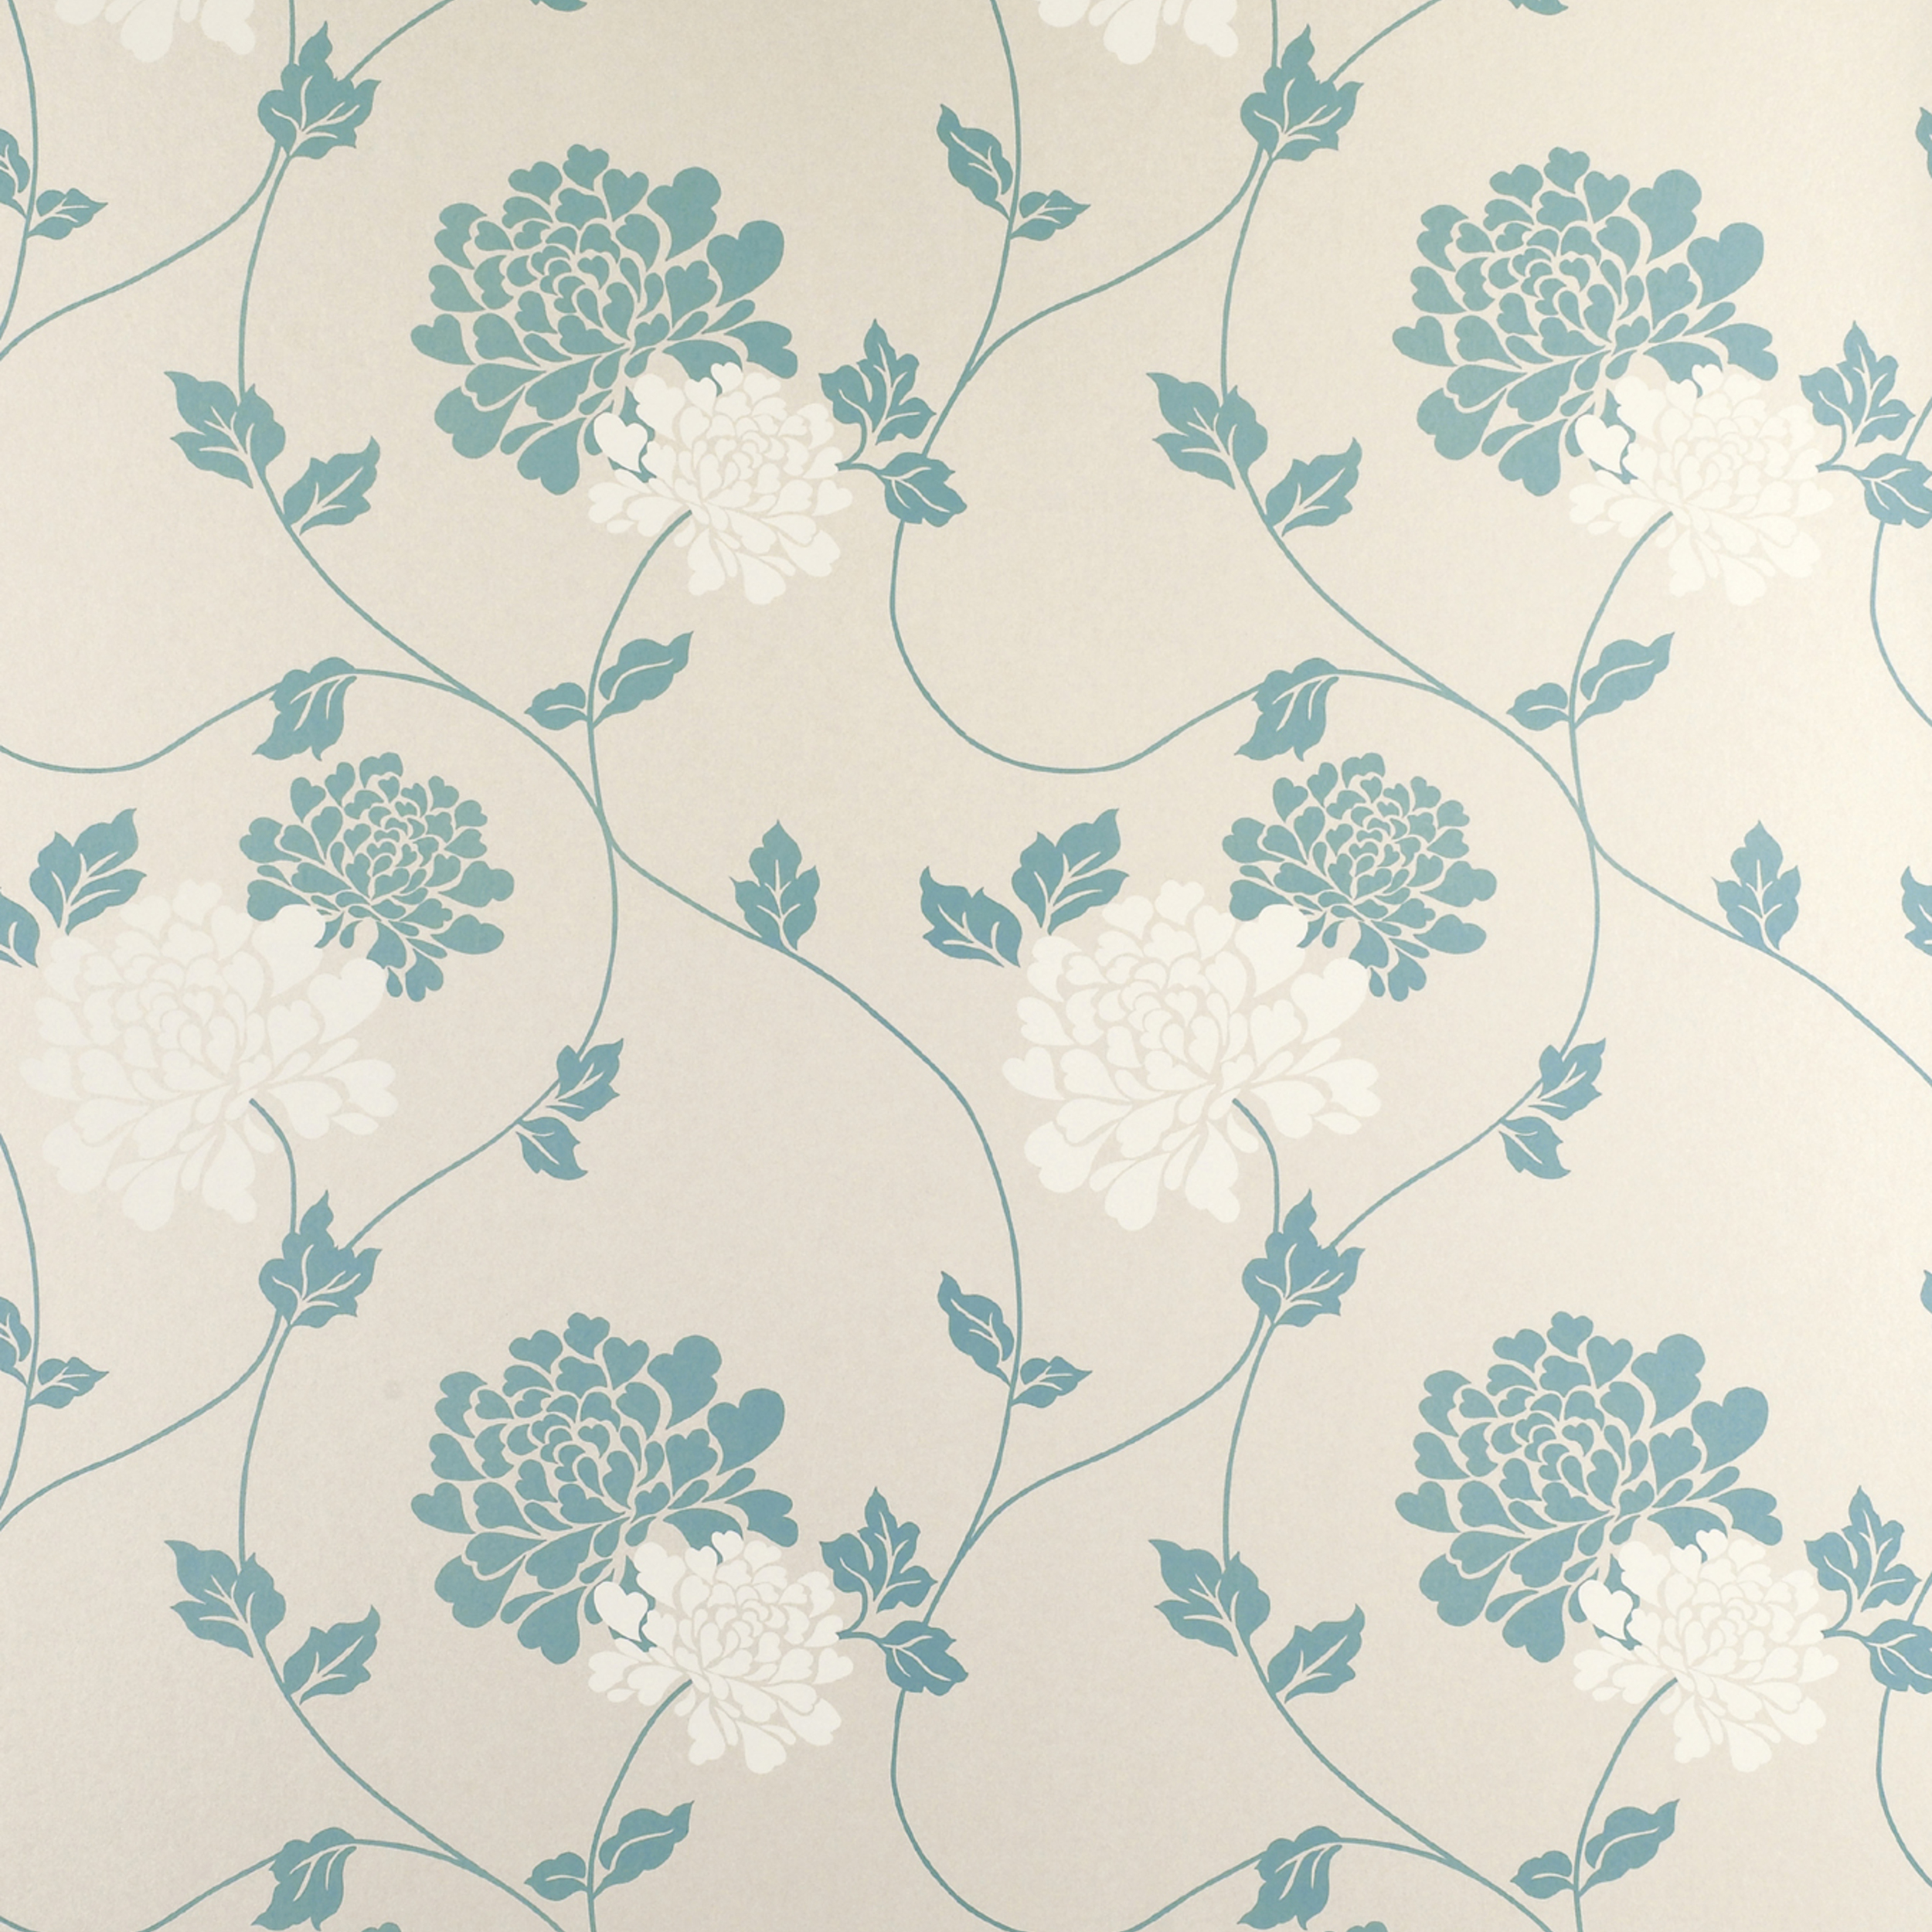 Gardenia Flower Delivery Teal Flower Wallpaper Wallpapersafari